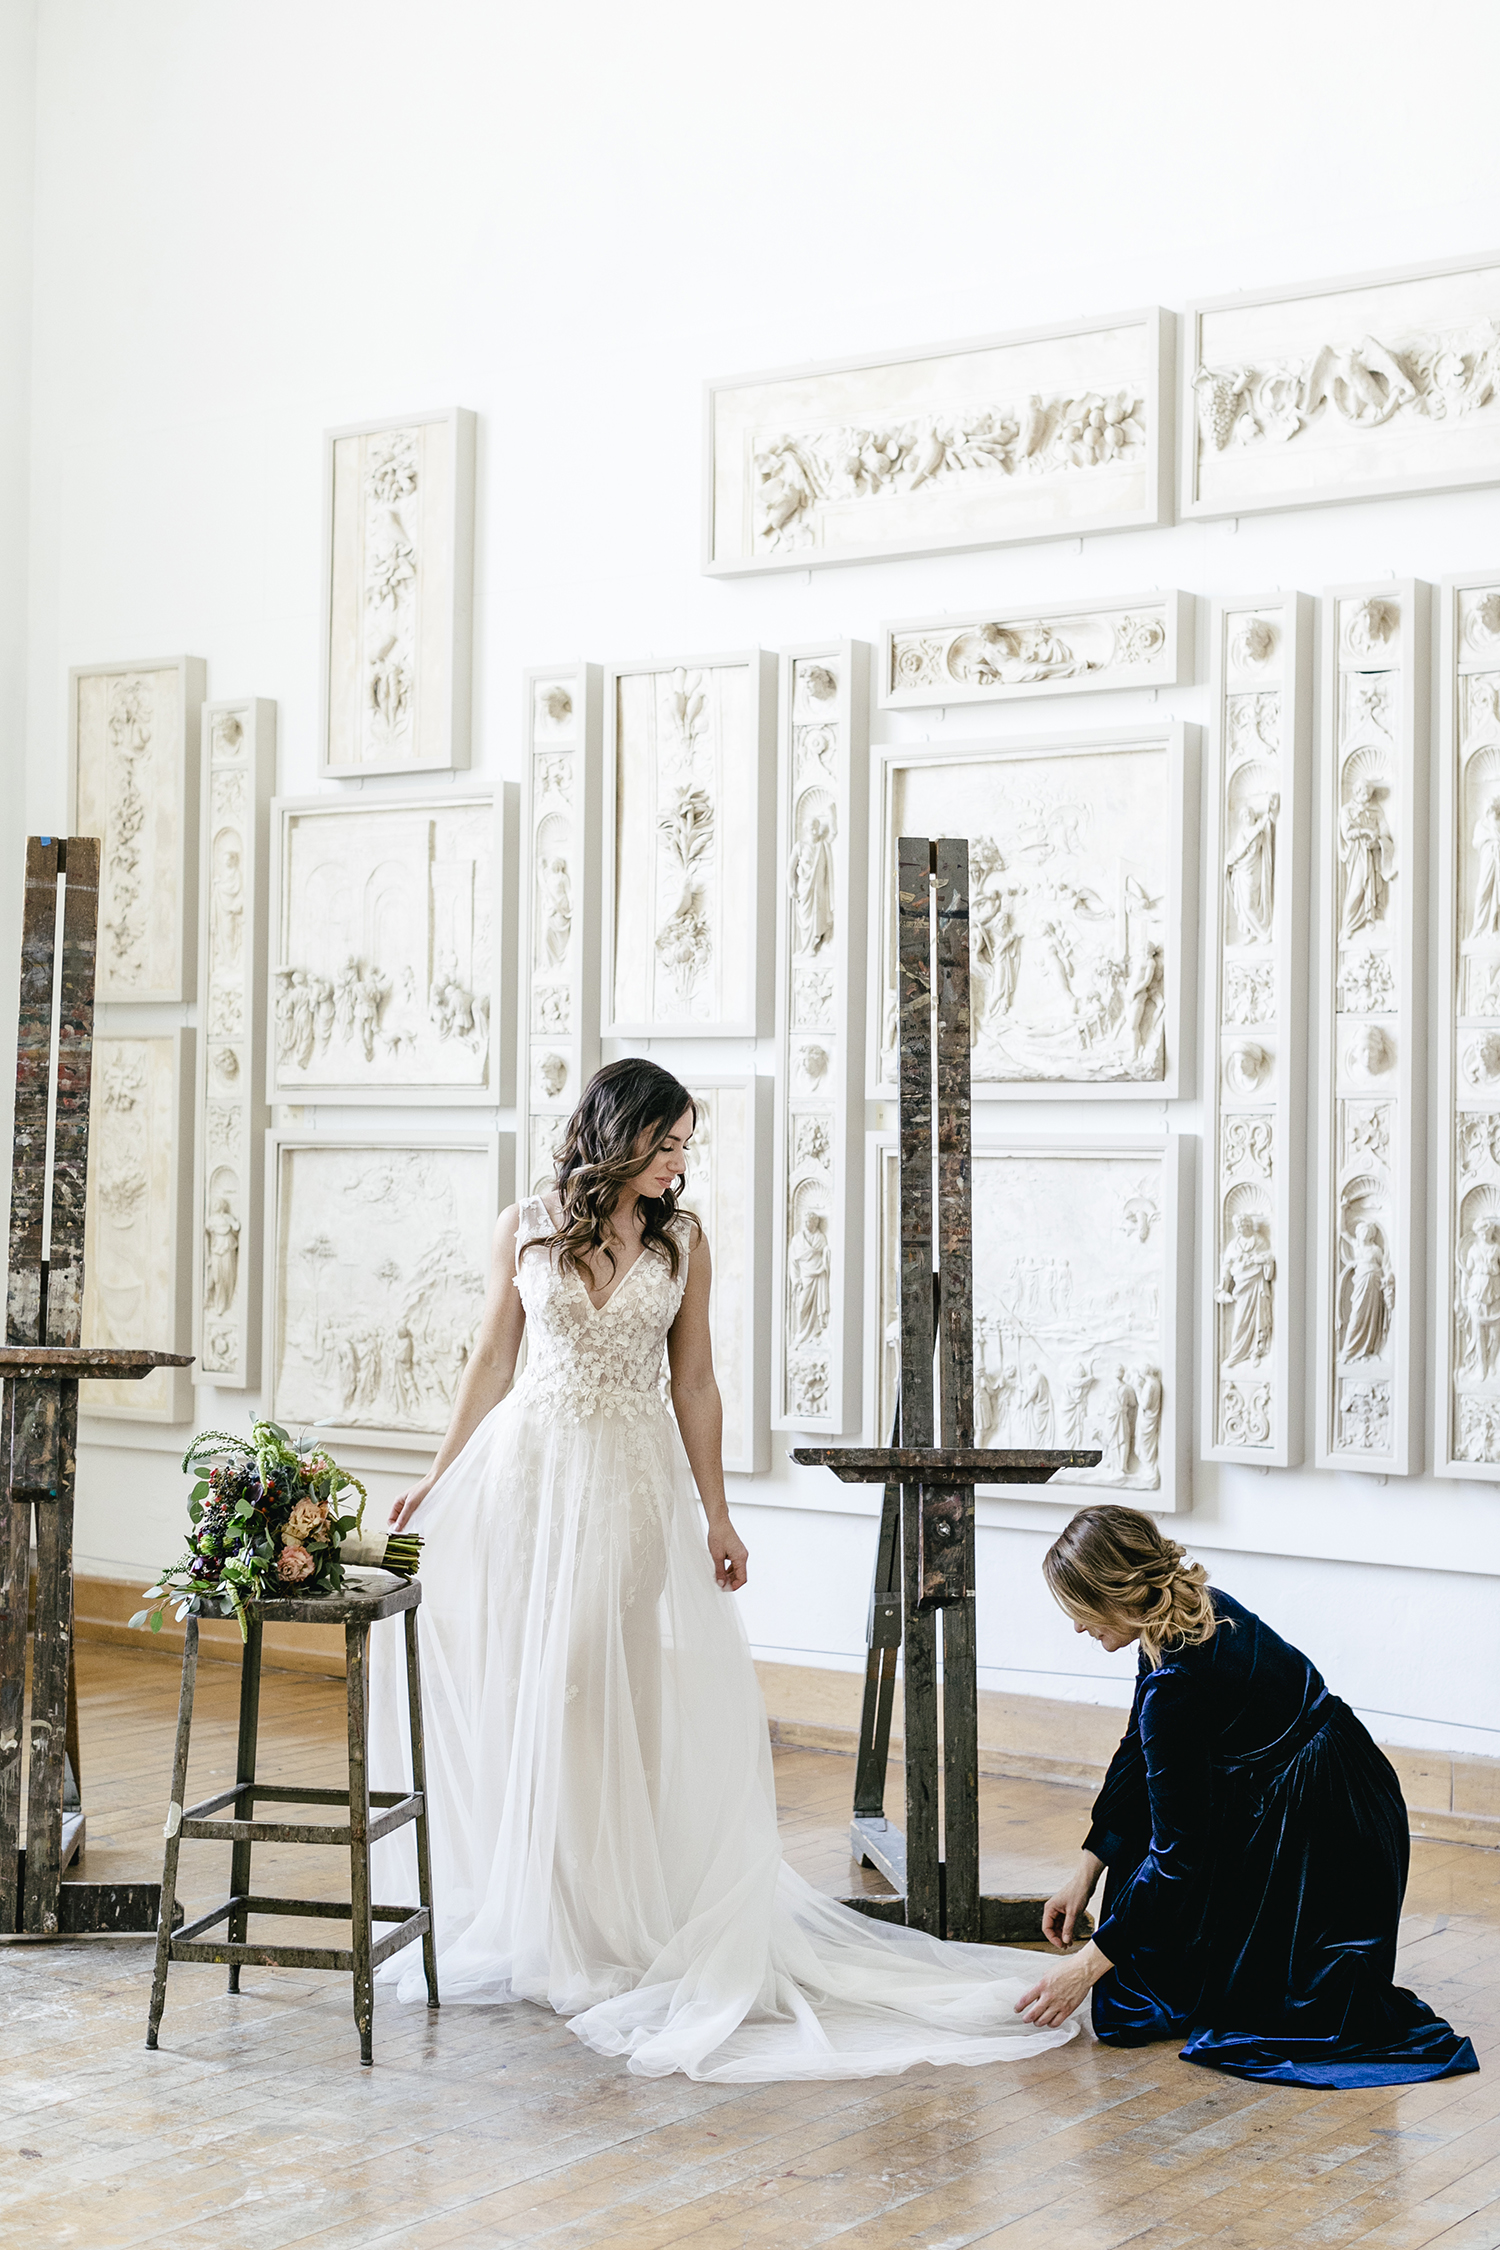 photography-wedding-weddings-natural-candid-pafa-pennsylvania academy-philadephia-philly-philadelphia wedding-mixed race-editorial-modern-fine-art-019.JPG